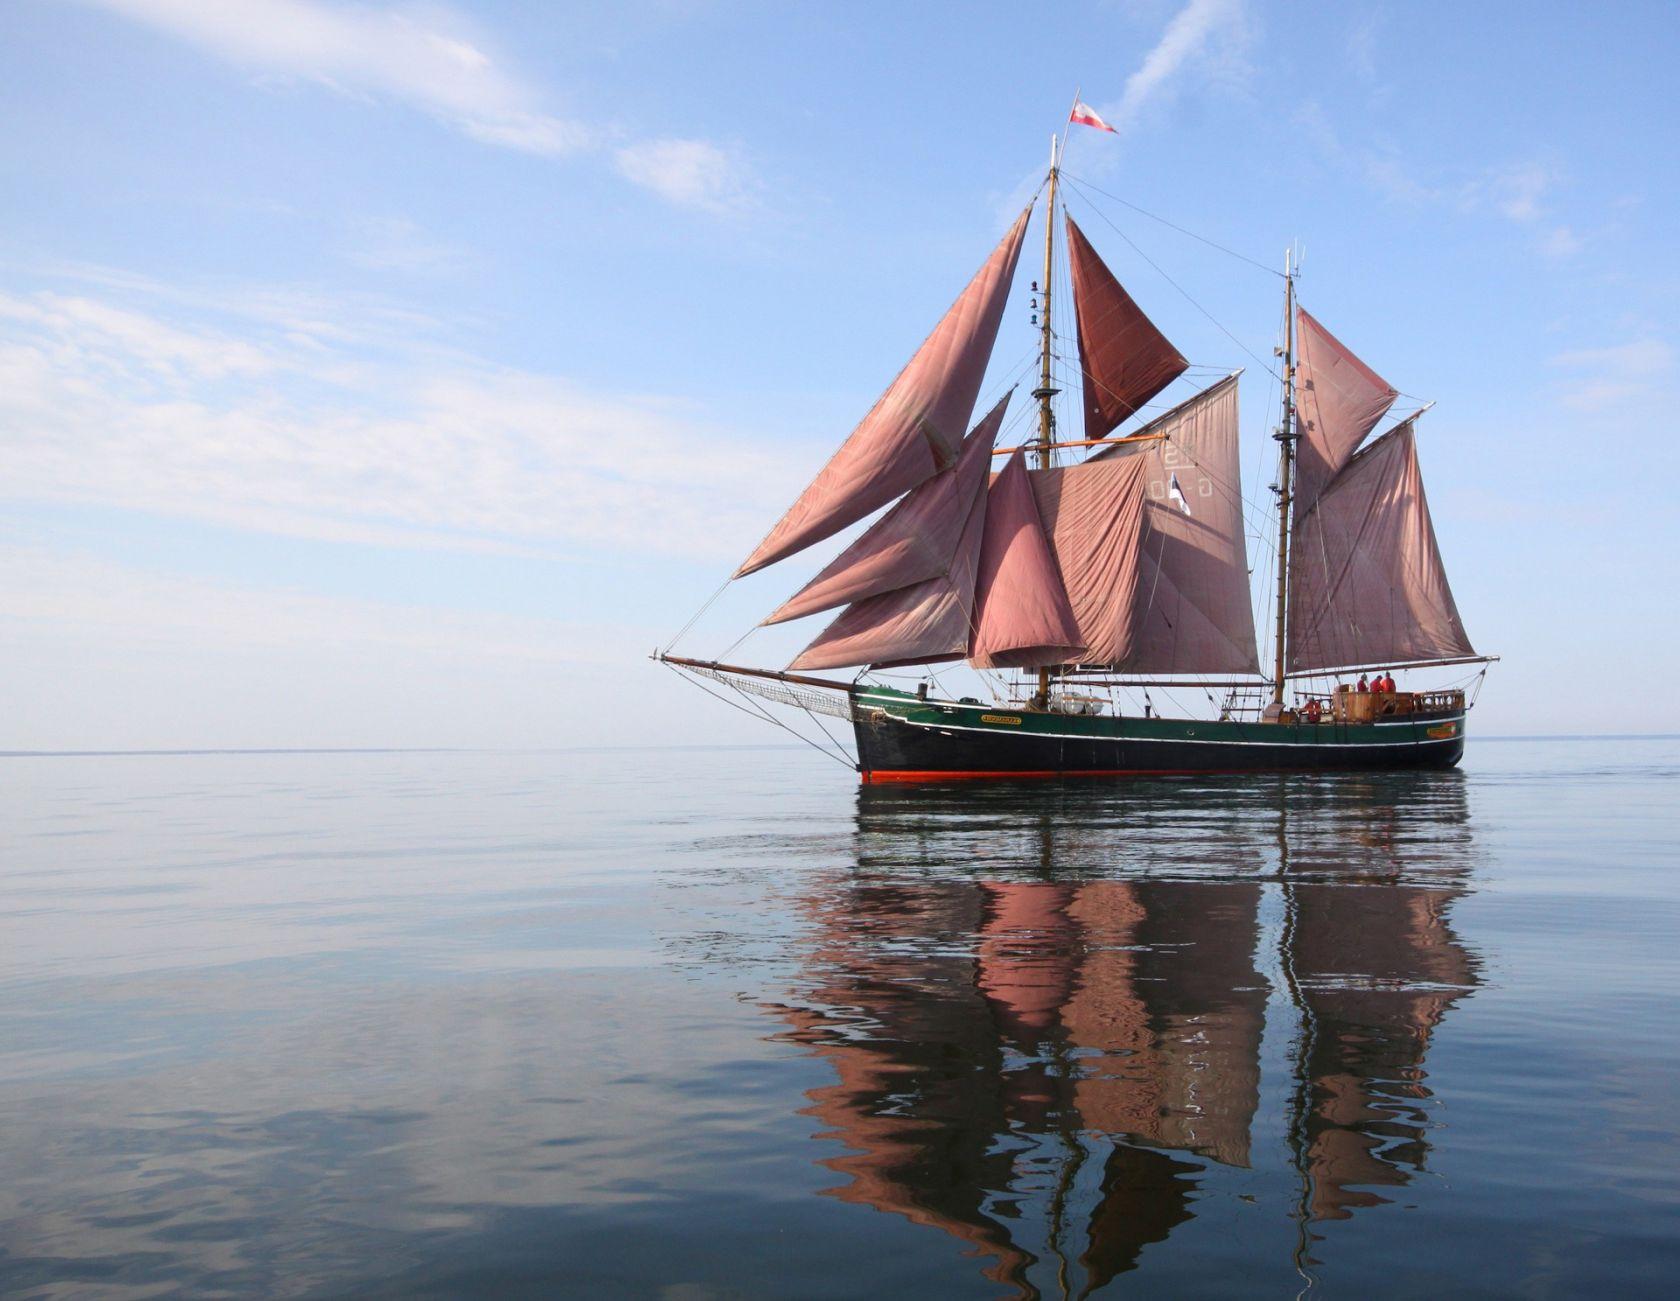 The ship Kajsamoor trips during 2015 summer season